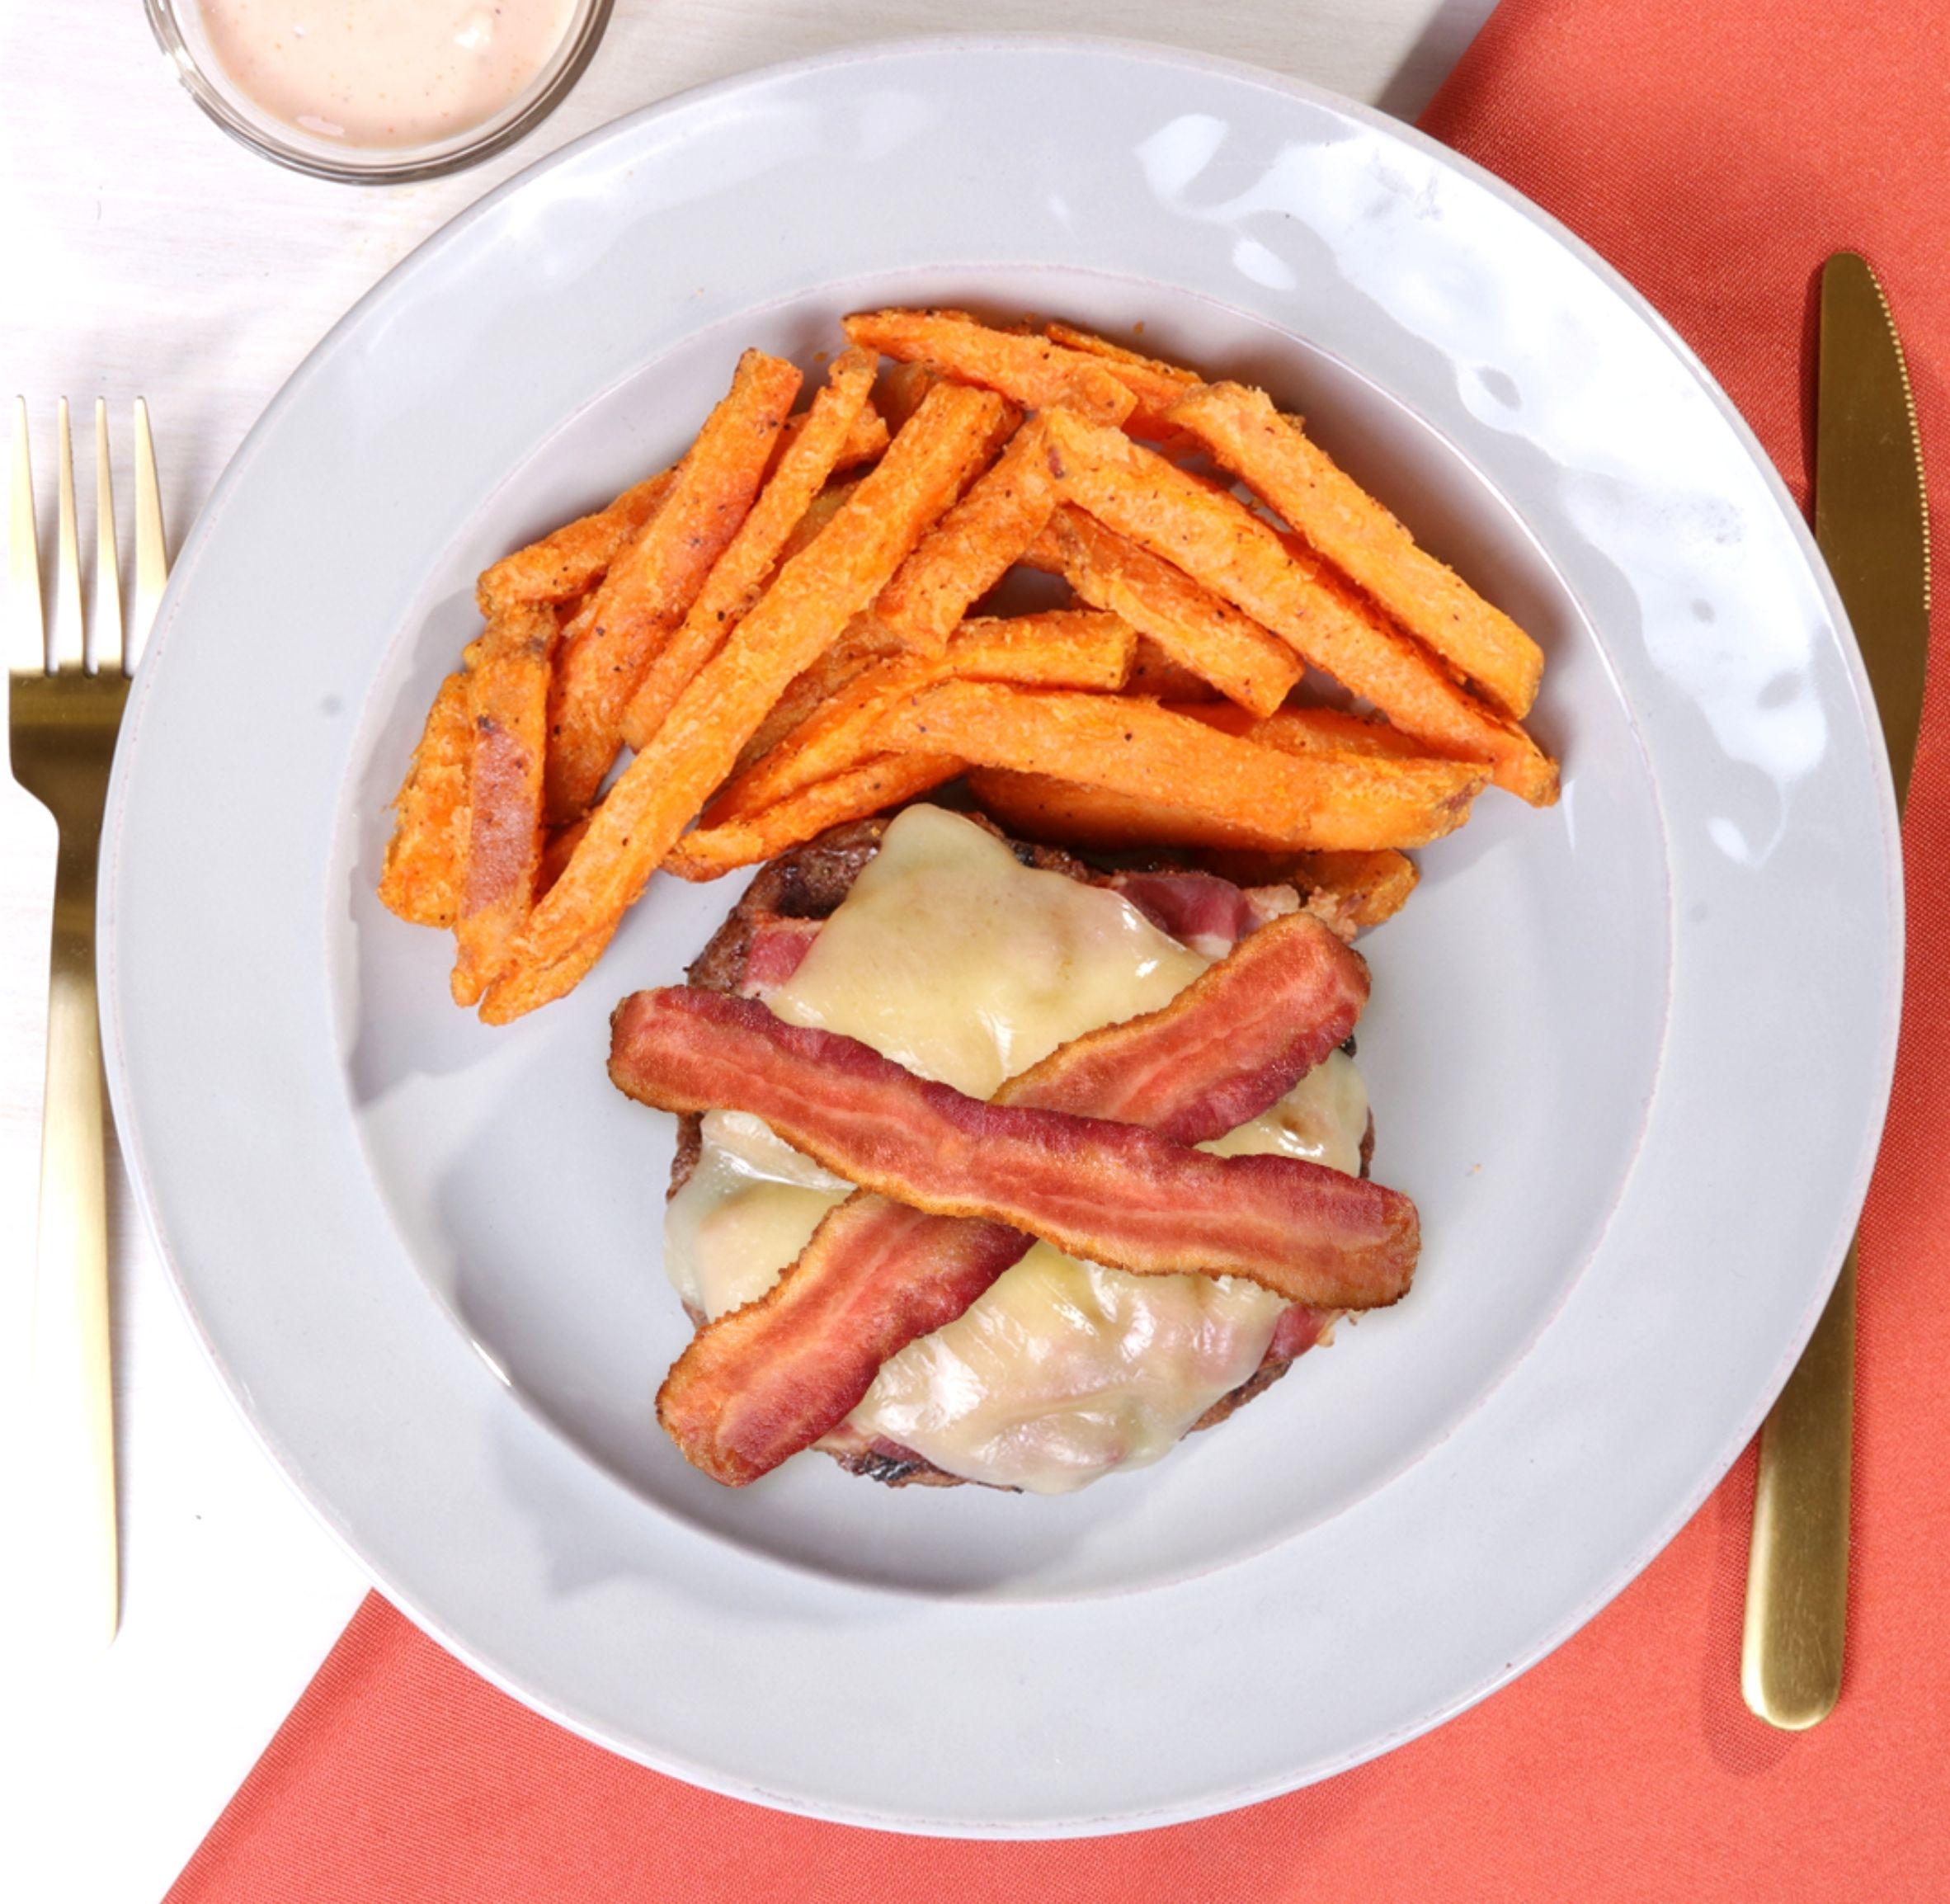 Bacon Burger Special